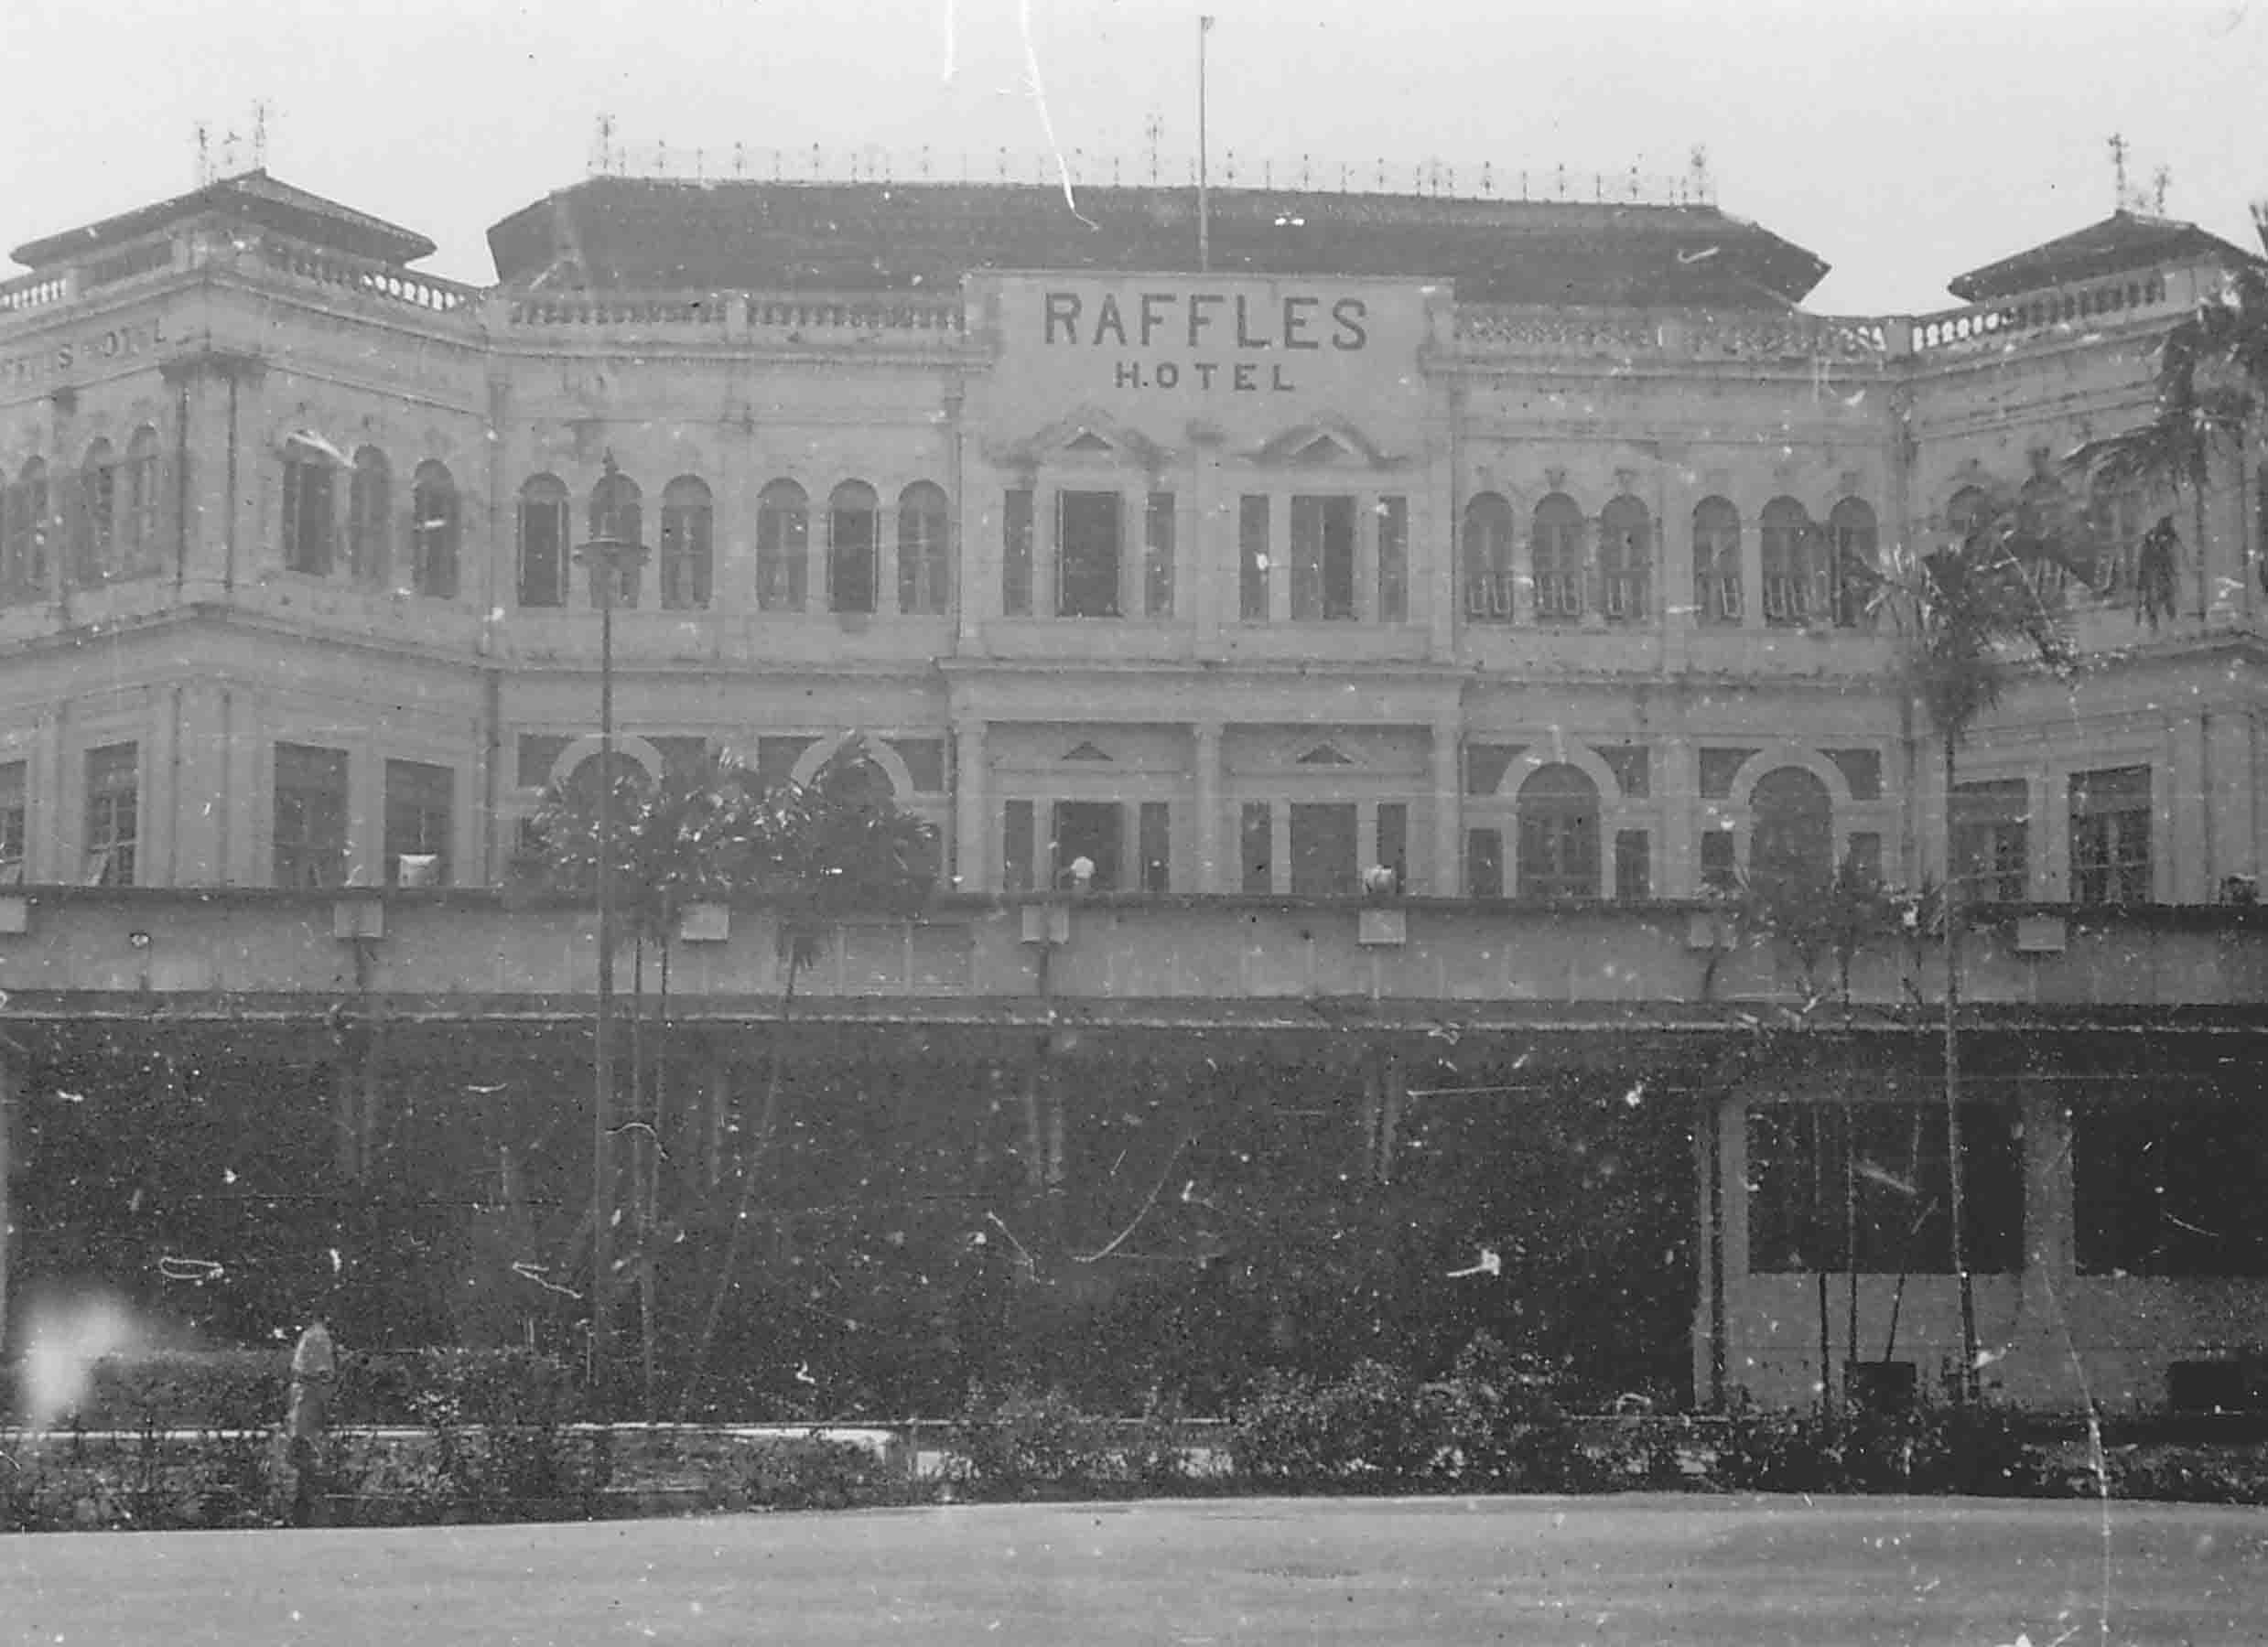 Raffles Hotel, Singapore, 1945